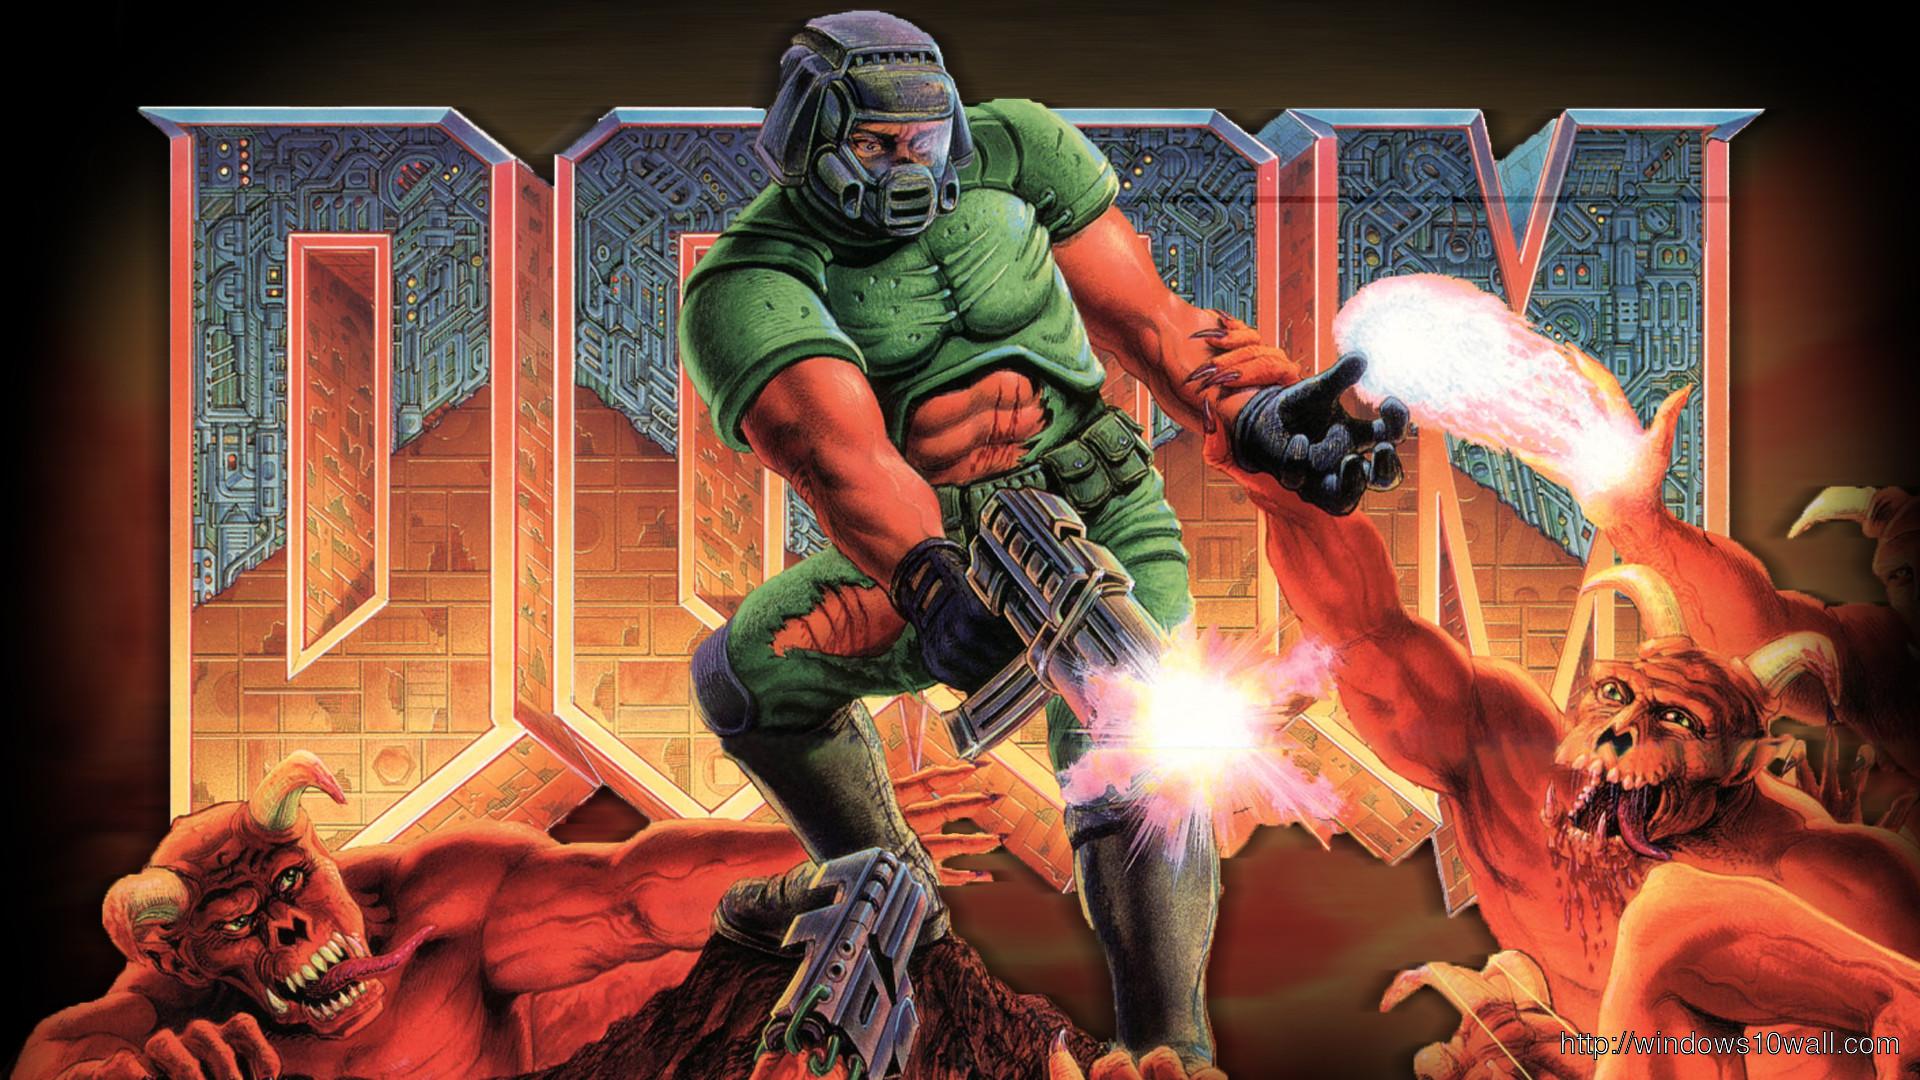 Res: 1920x1080, Doom Monsters Game Wallpaper